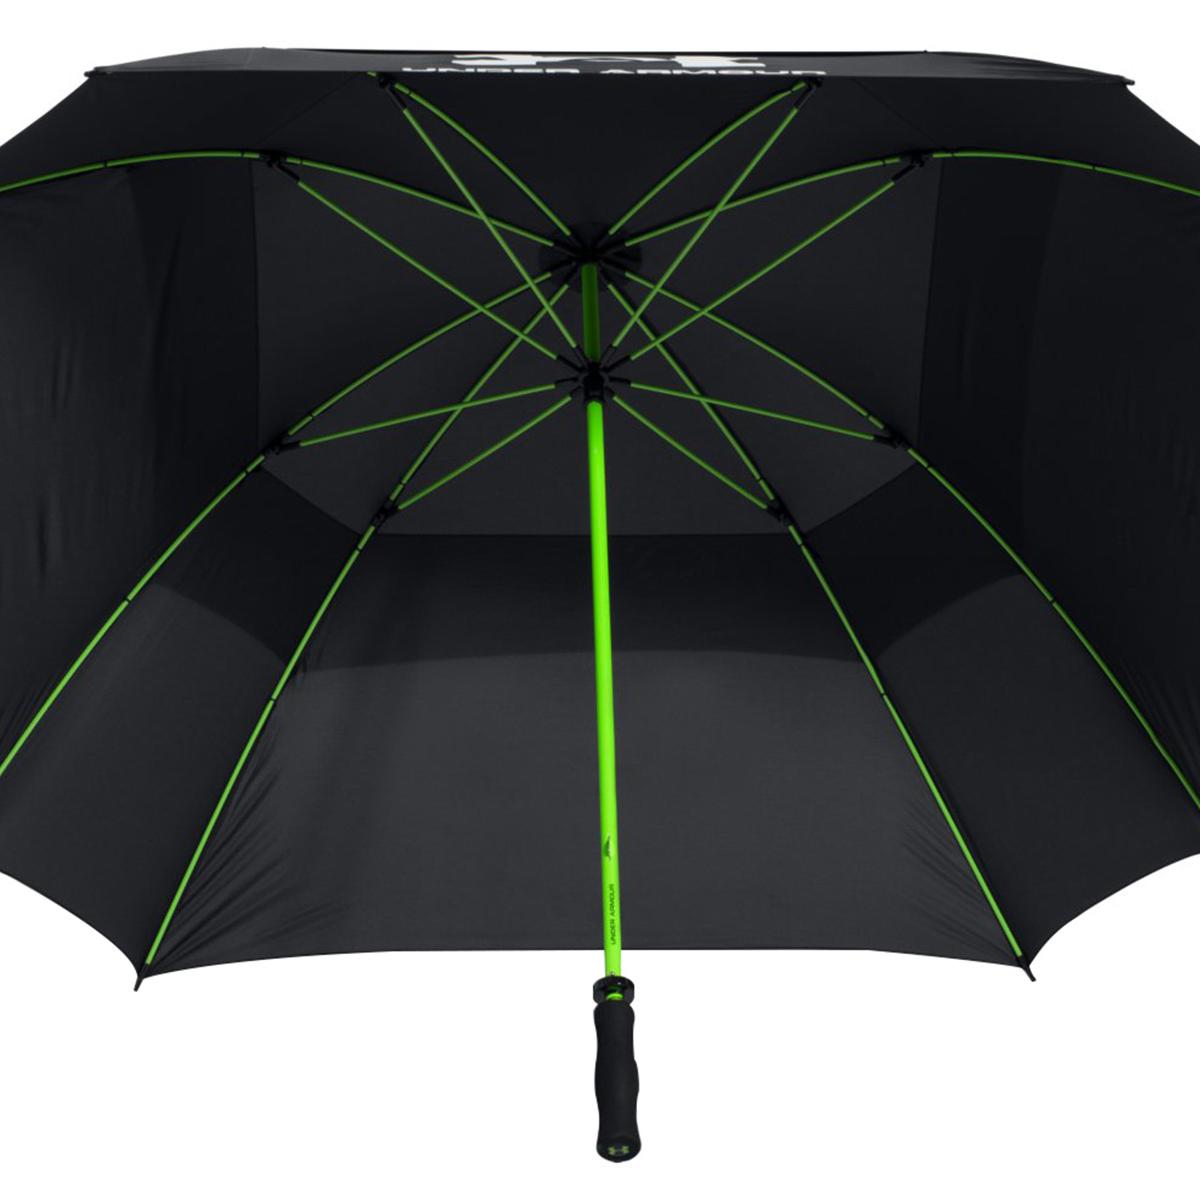 Mordrin sanar ignorar  Parapluie Under Armour Dual Canopy | Online Golf